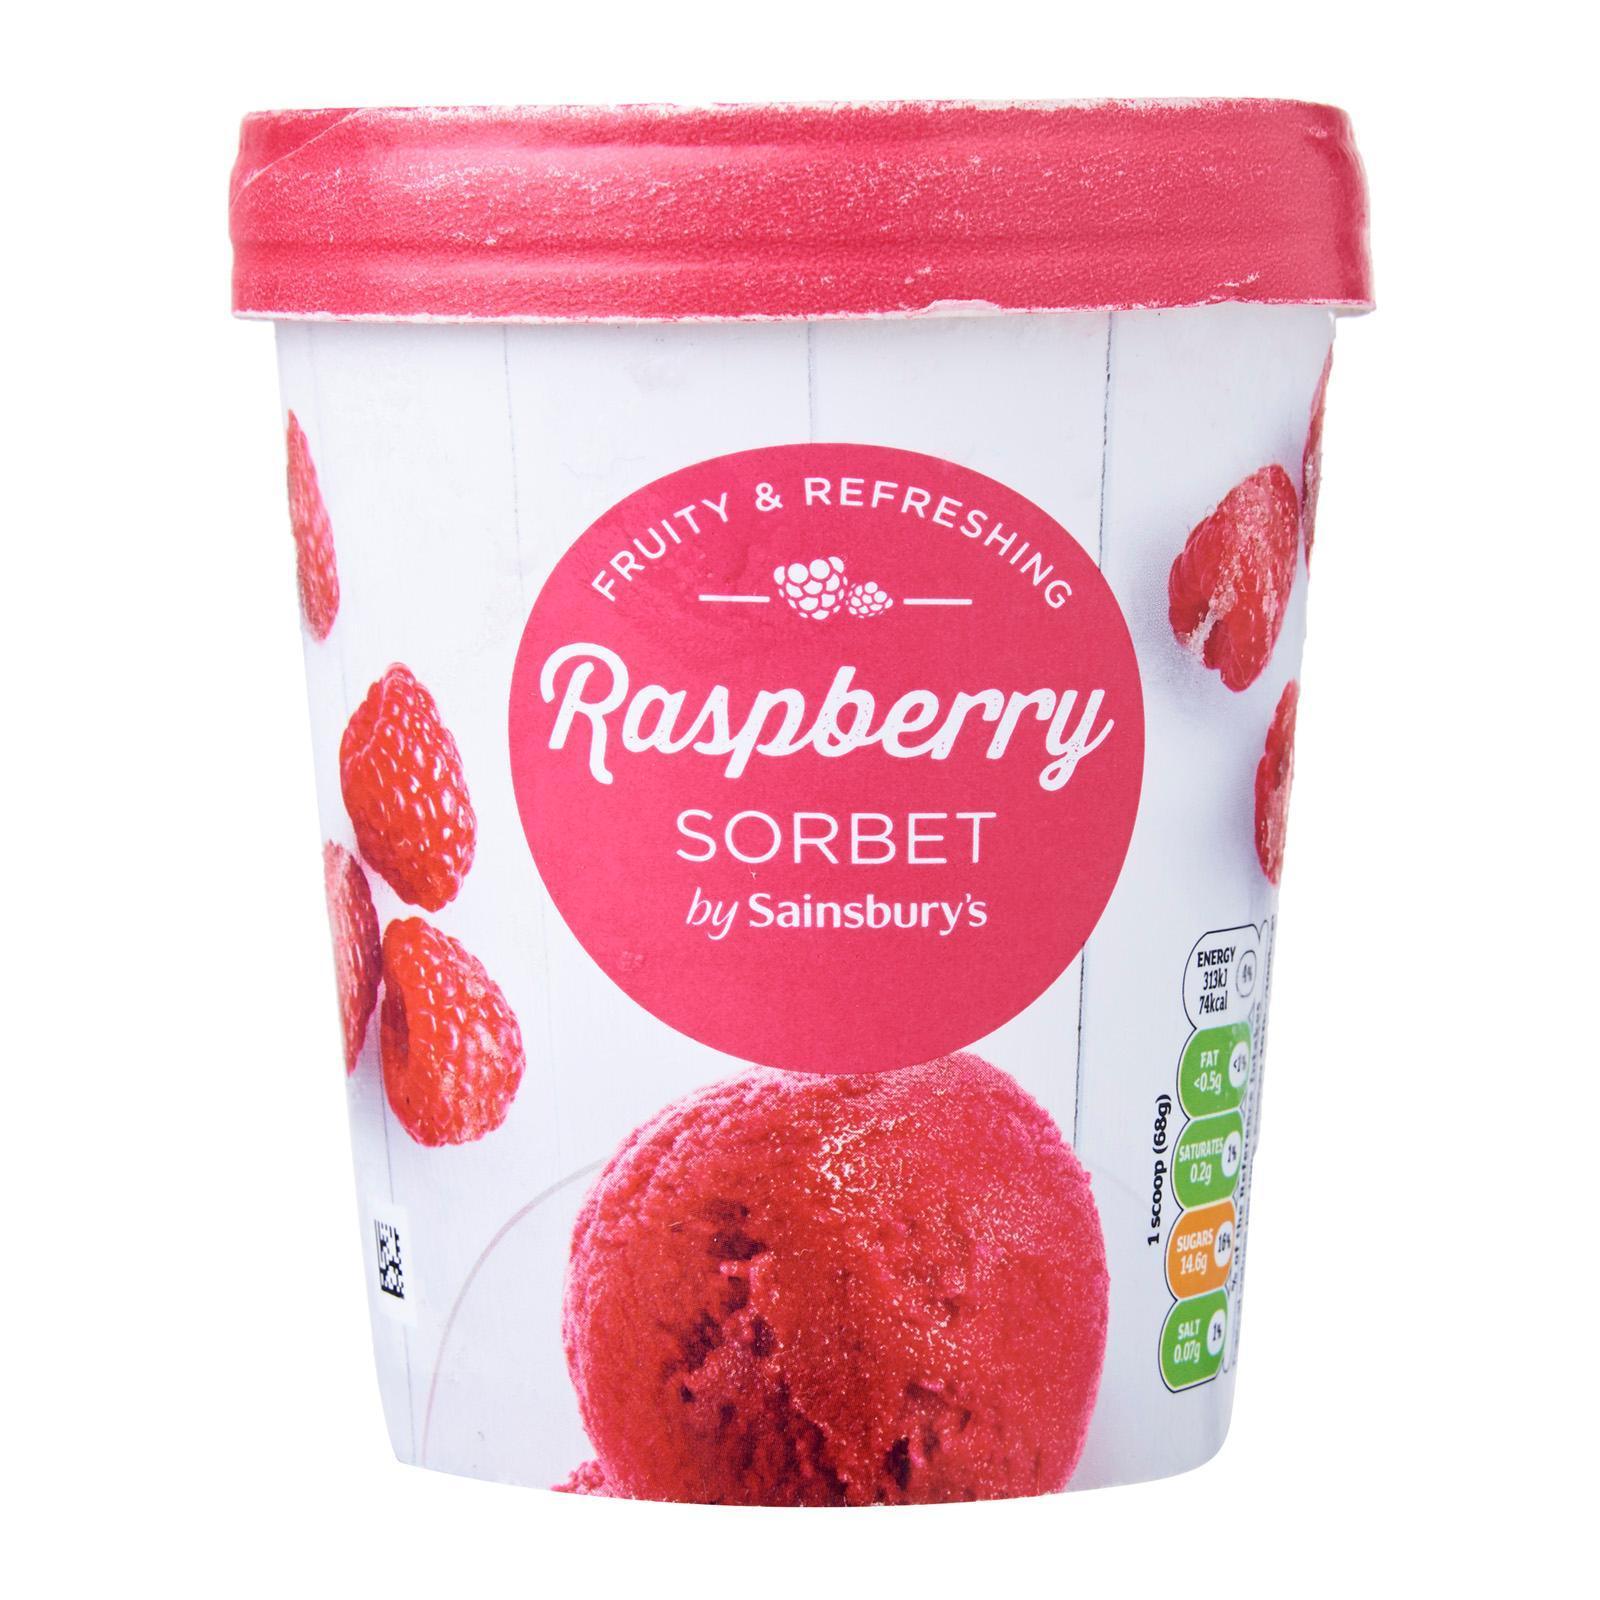 Sainsbury's Raspberry Sorbet - Frozen